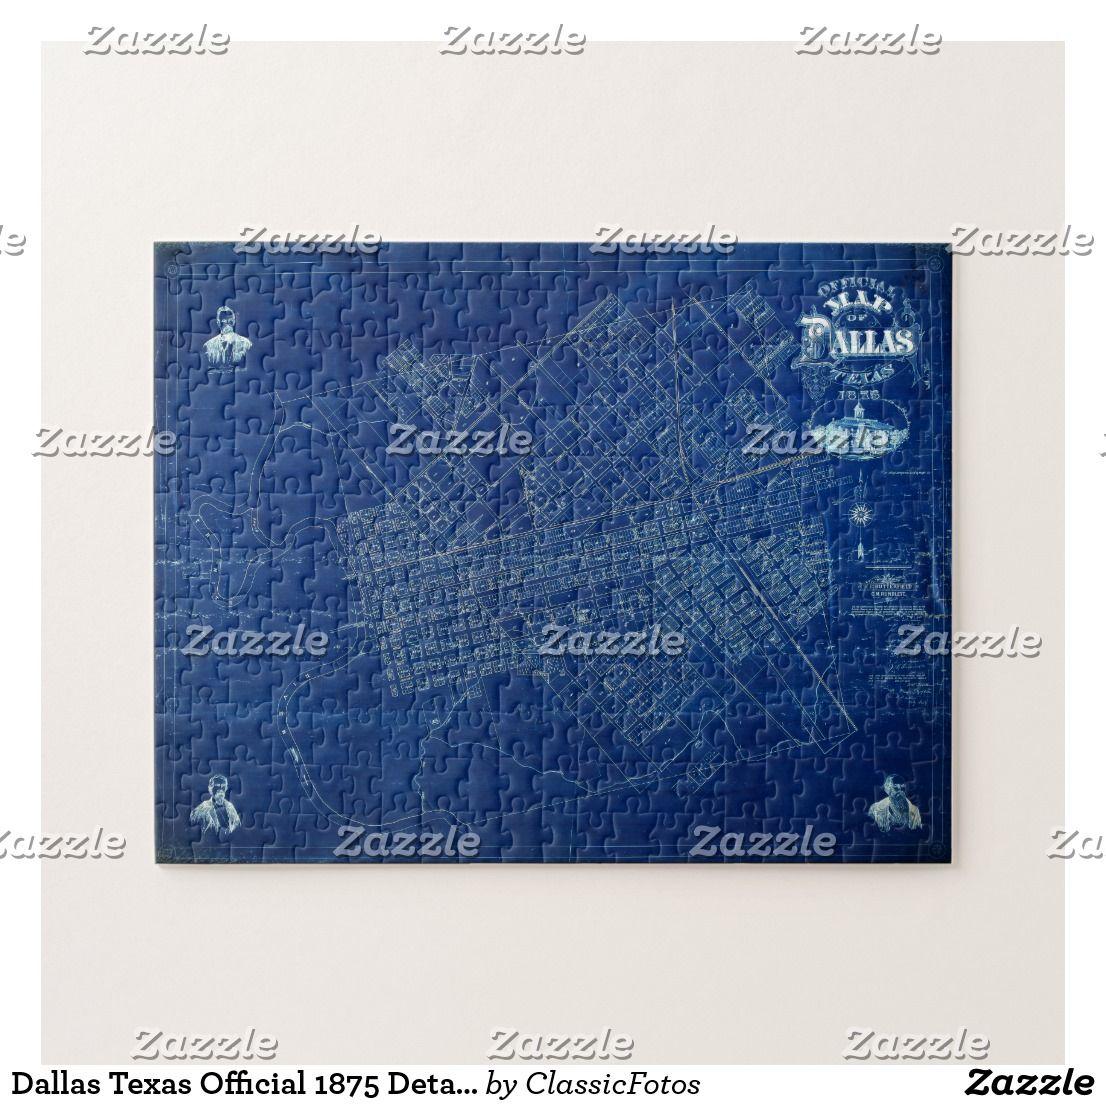 Dallas texas official 1875 detailed blueprint map jigsaw puzzle dallas texas official 1875 detailed blueprint map jigsaw puzzle malvernweather Image collections